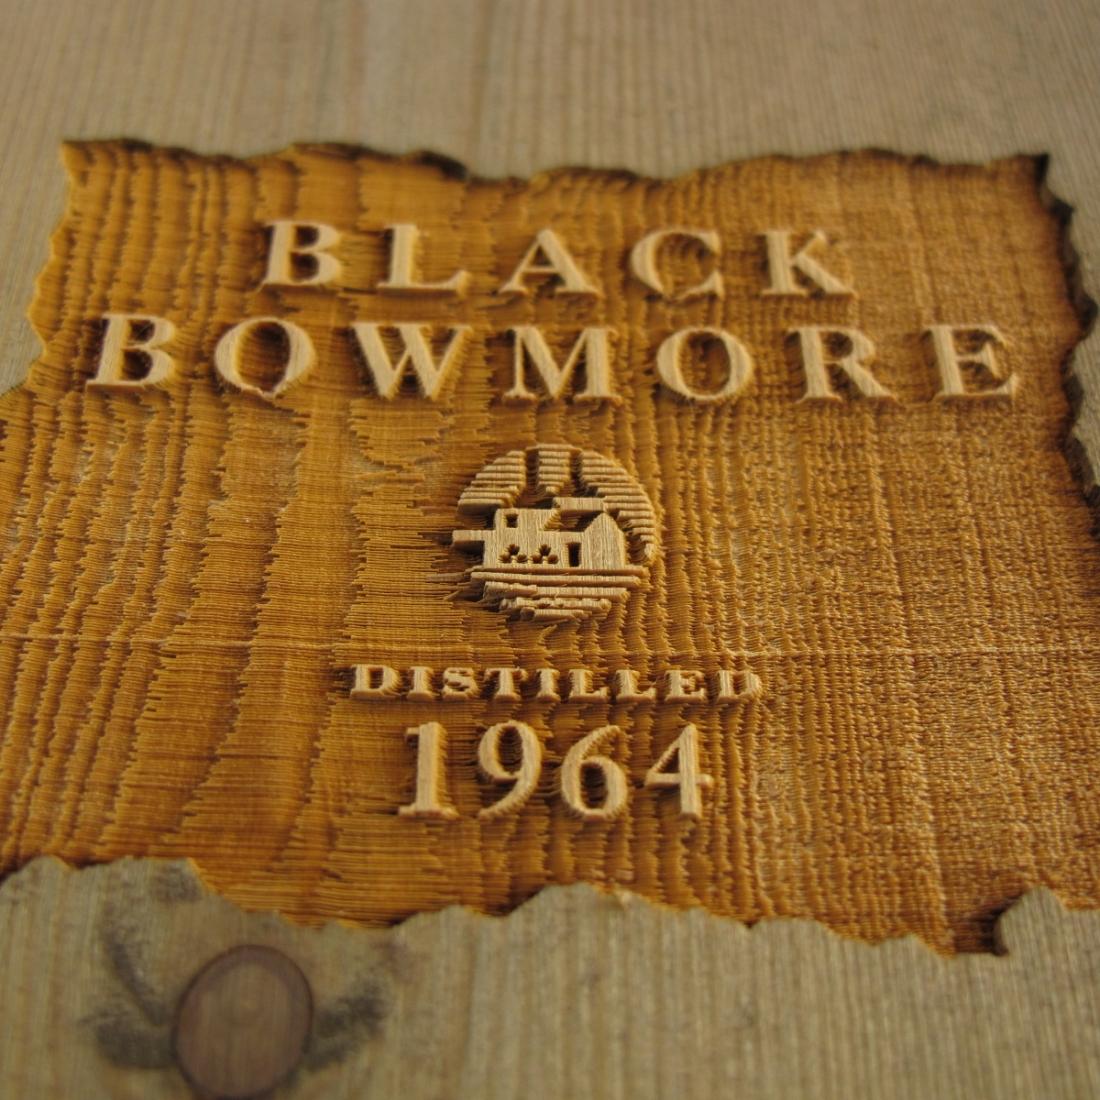 Bowmore 1964 Black Bowmore 29 Year Old 1st Edition